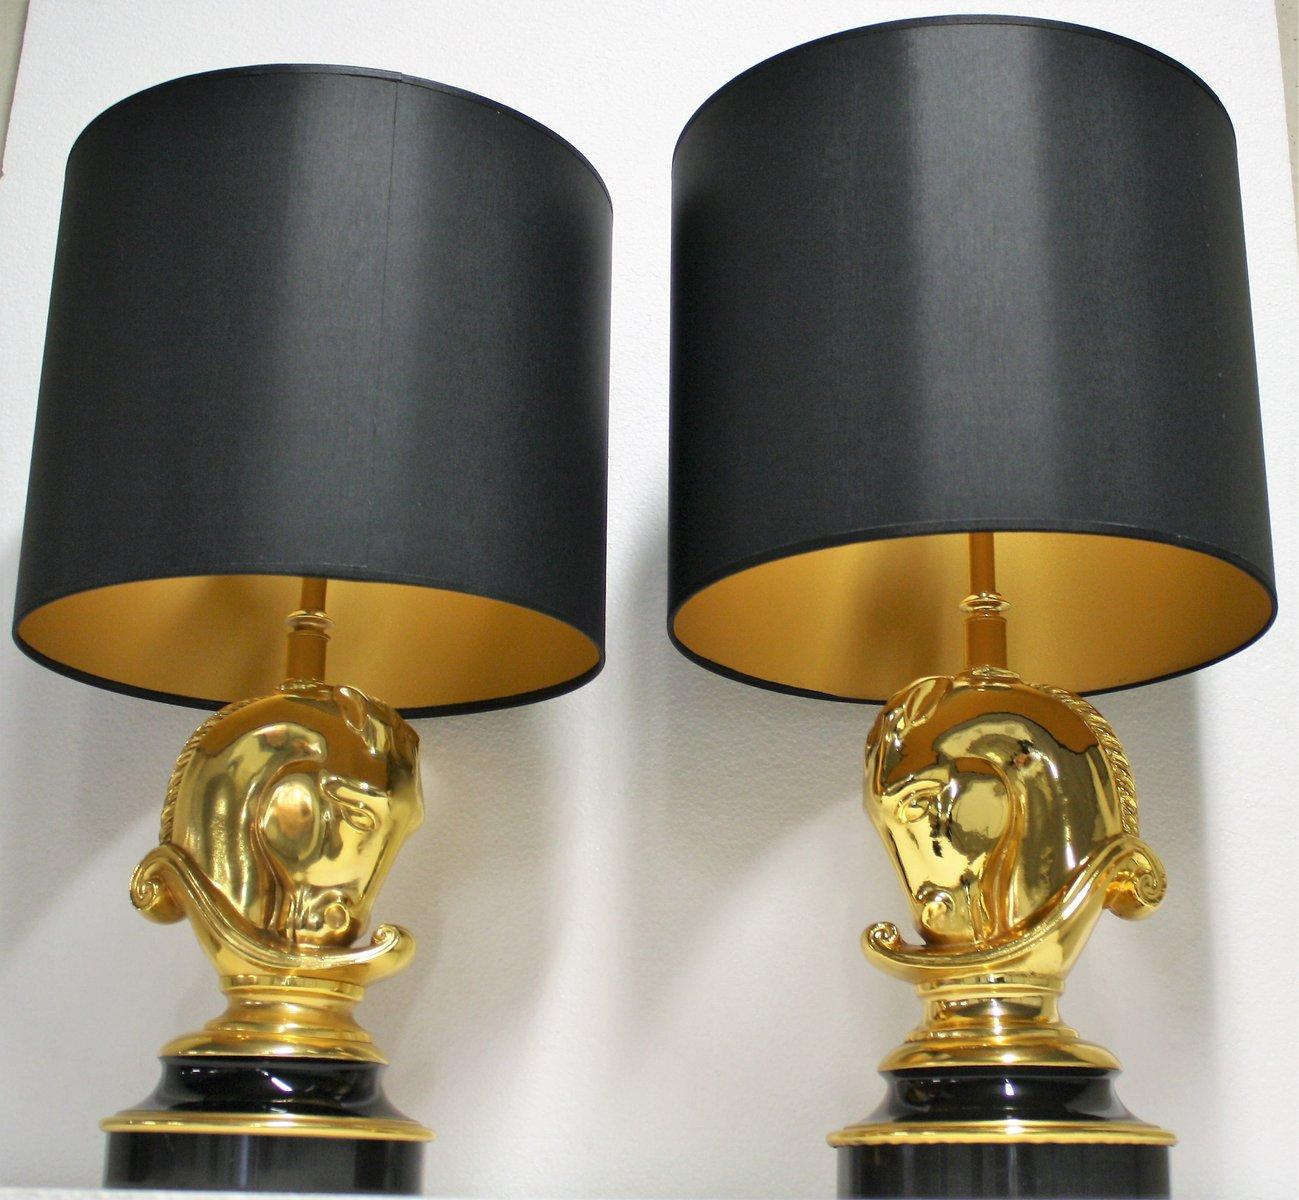 Hollywood Regency Brass Horse Head Table Lamps From Deknudt, 1970s, Set Of 2